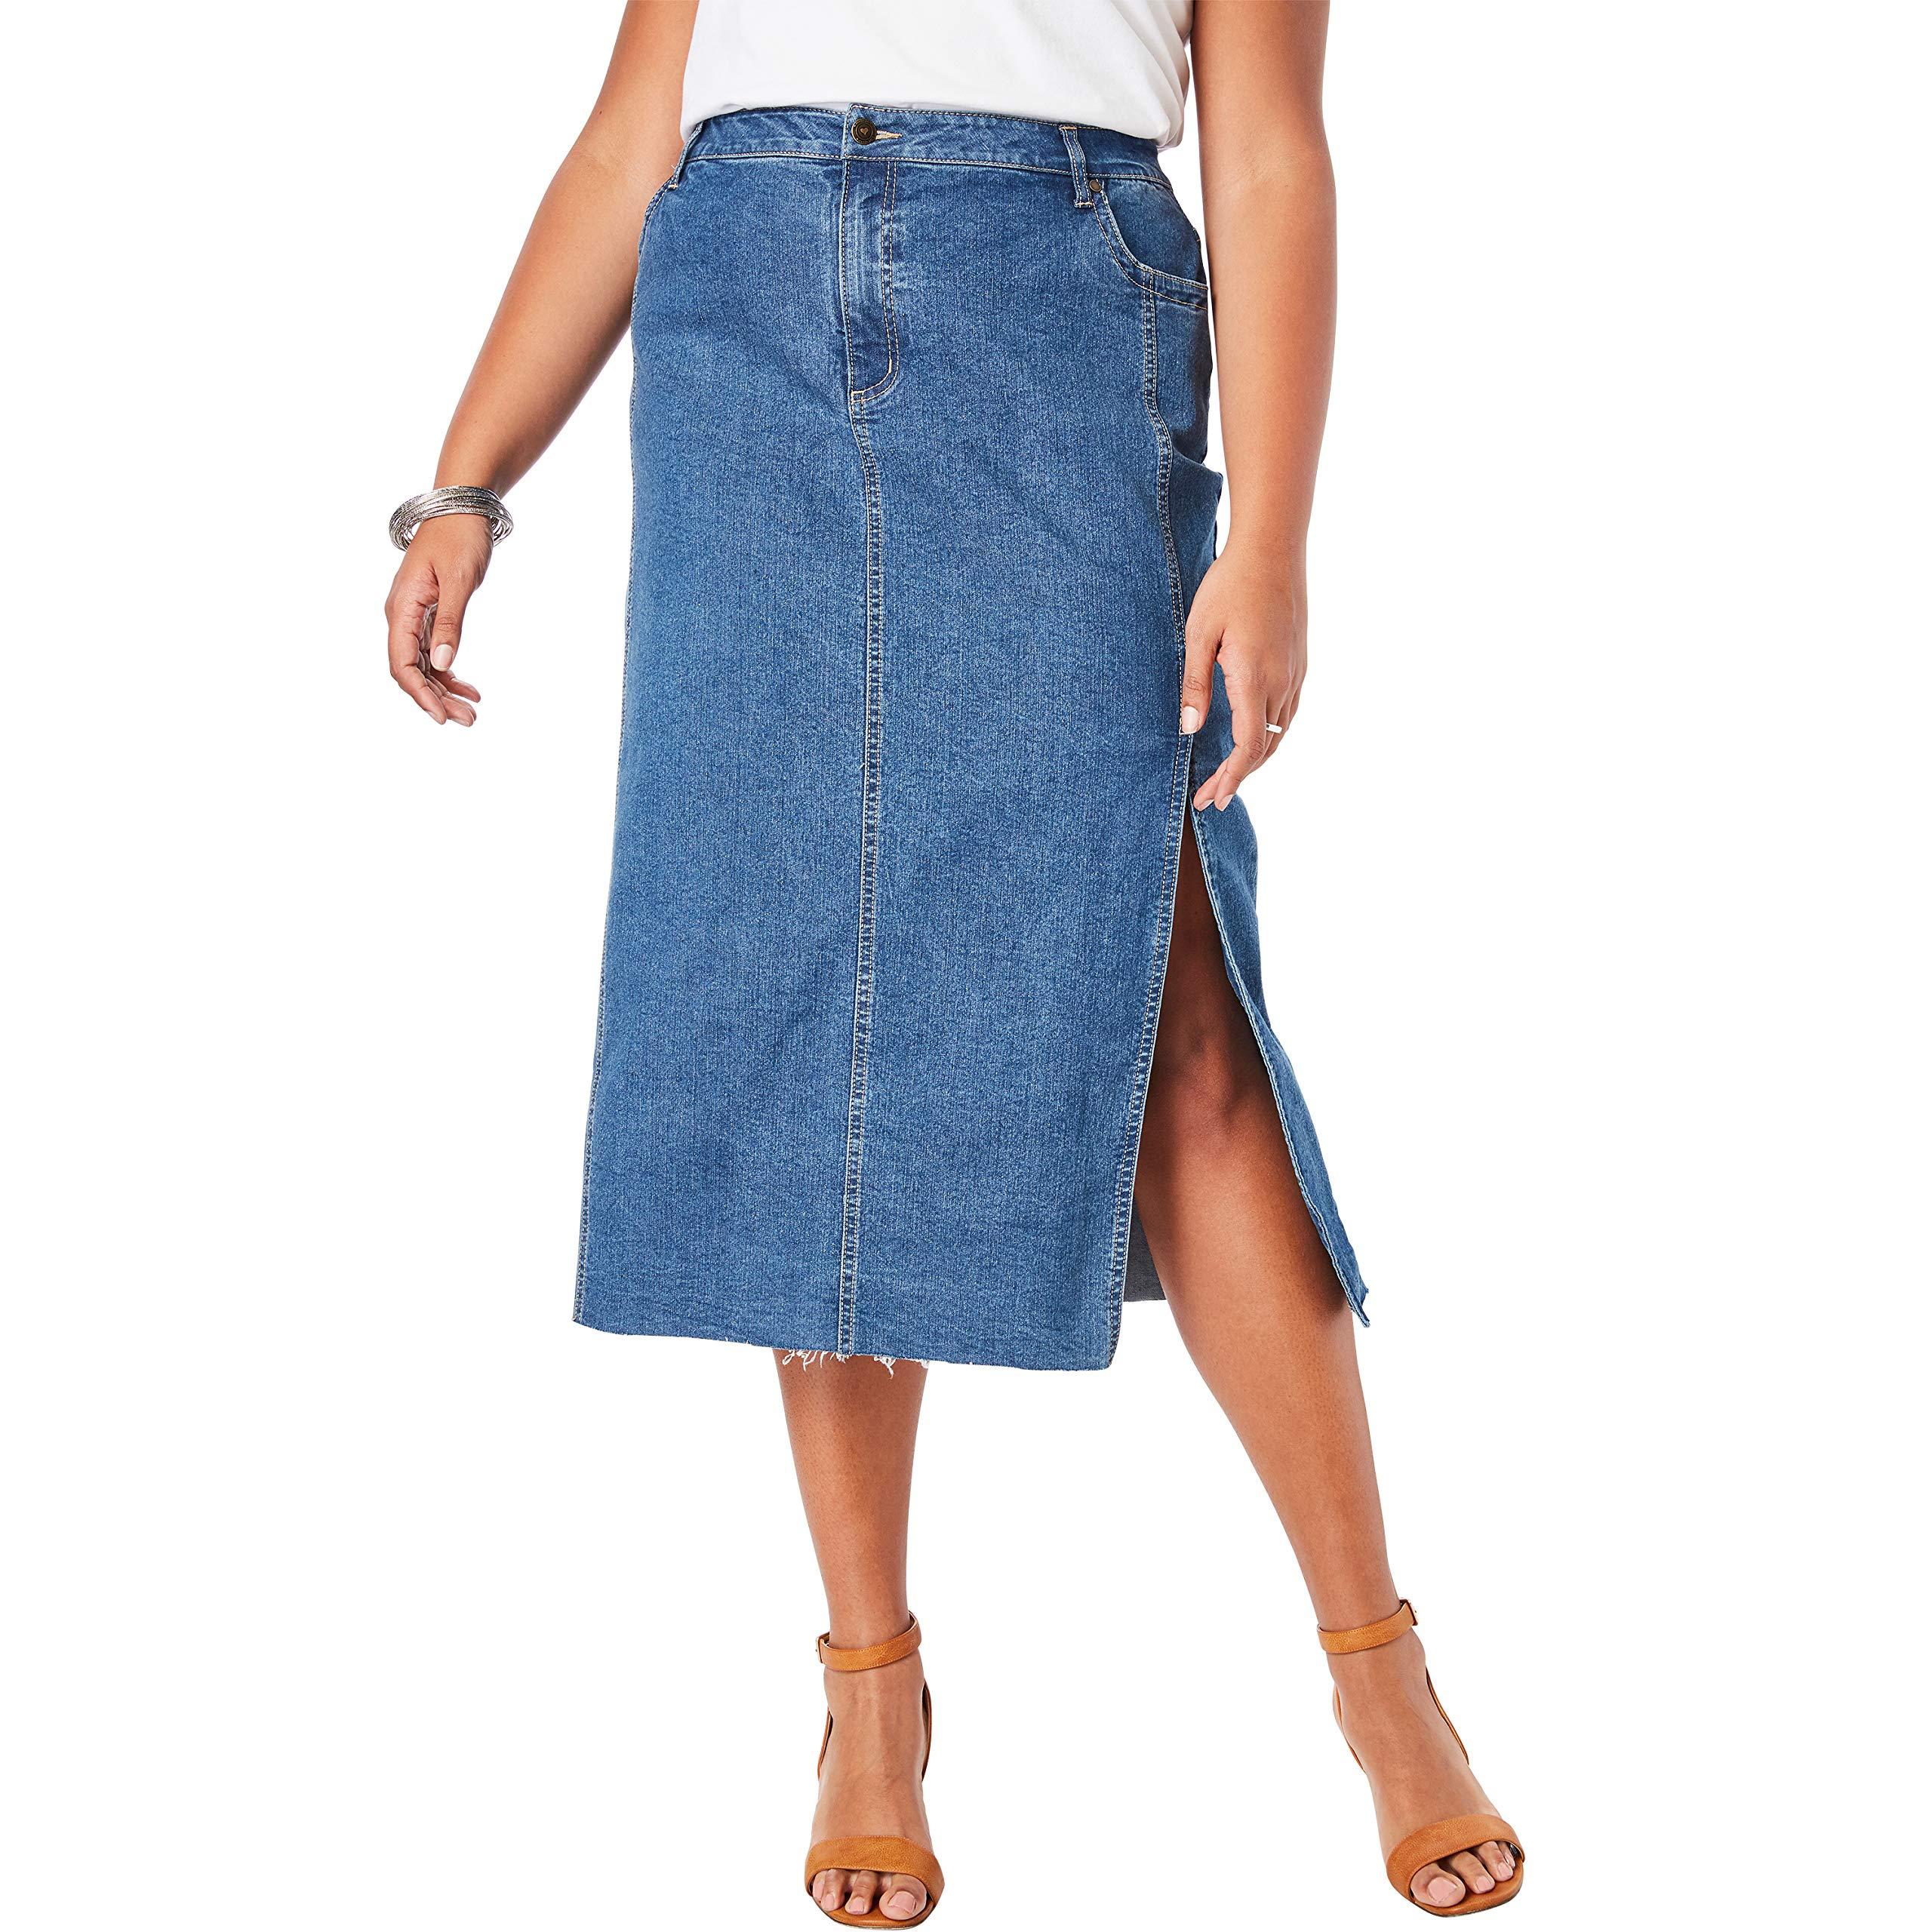 Roamans Women's Plus Size Midi Jean Skirt - Medium Wash, 18 W by Roamans